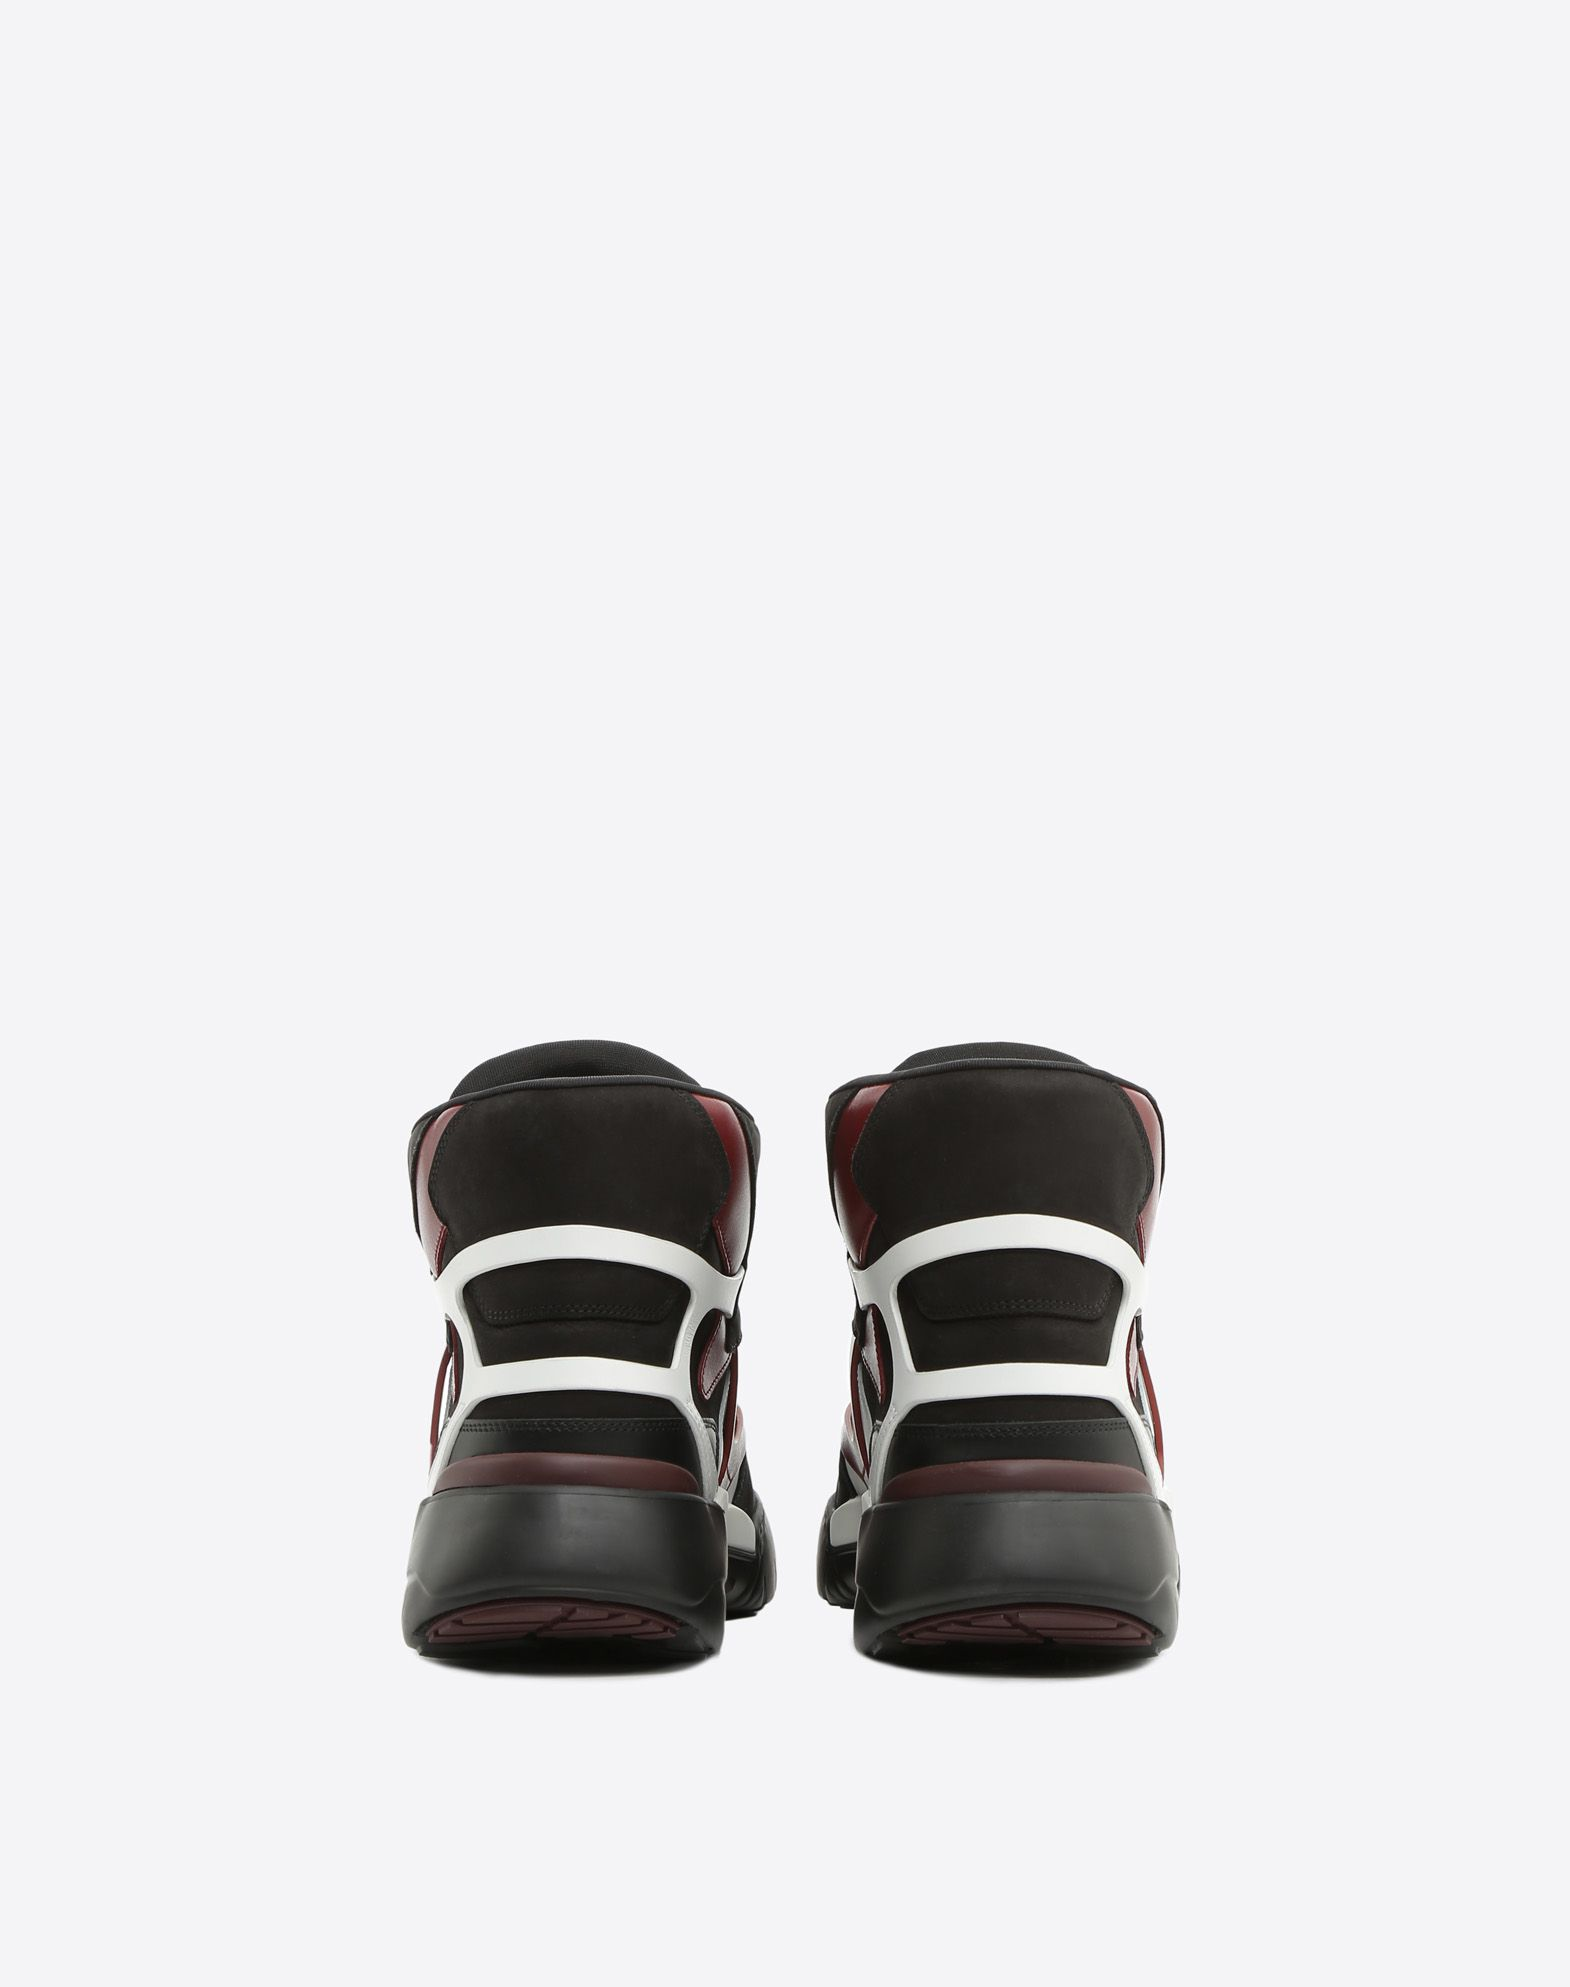 VALENTINO GARAVANI UOMO Made One 运动鞋 高帮运动鞋 U d